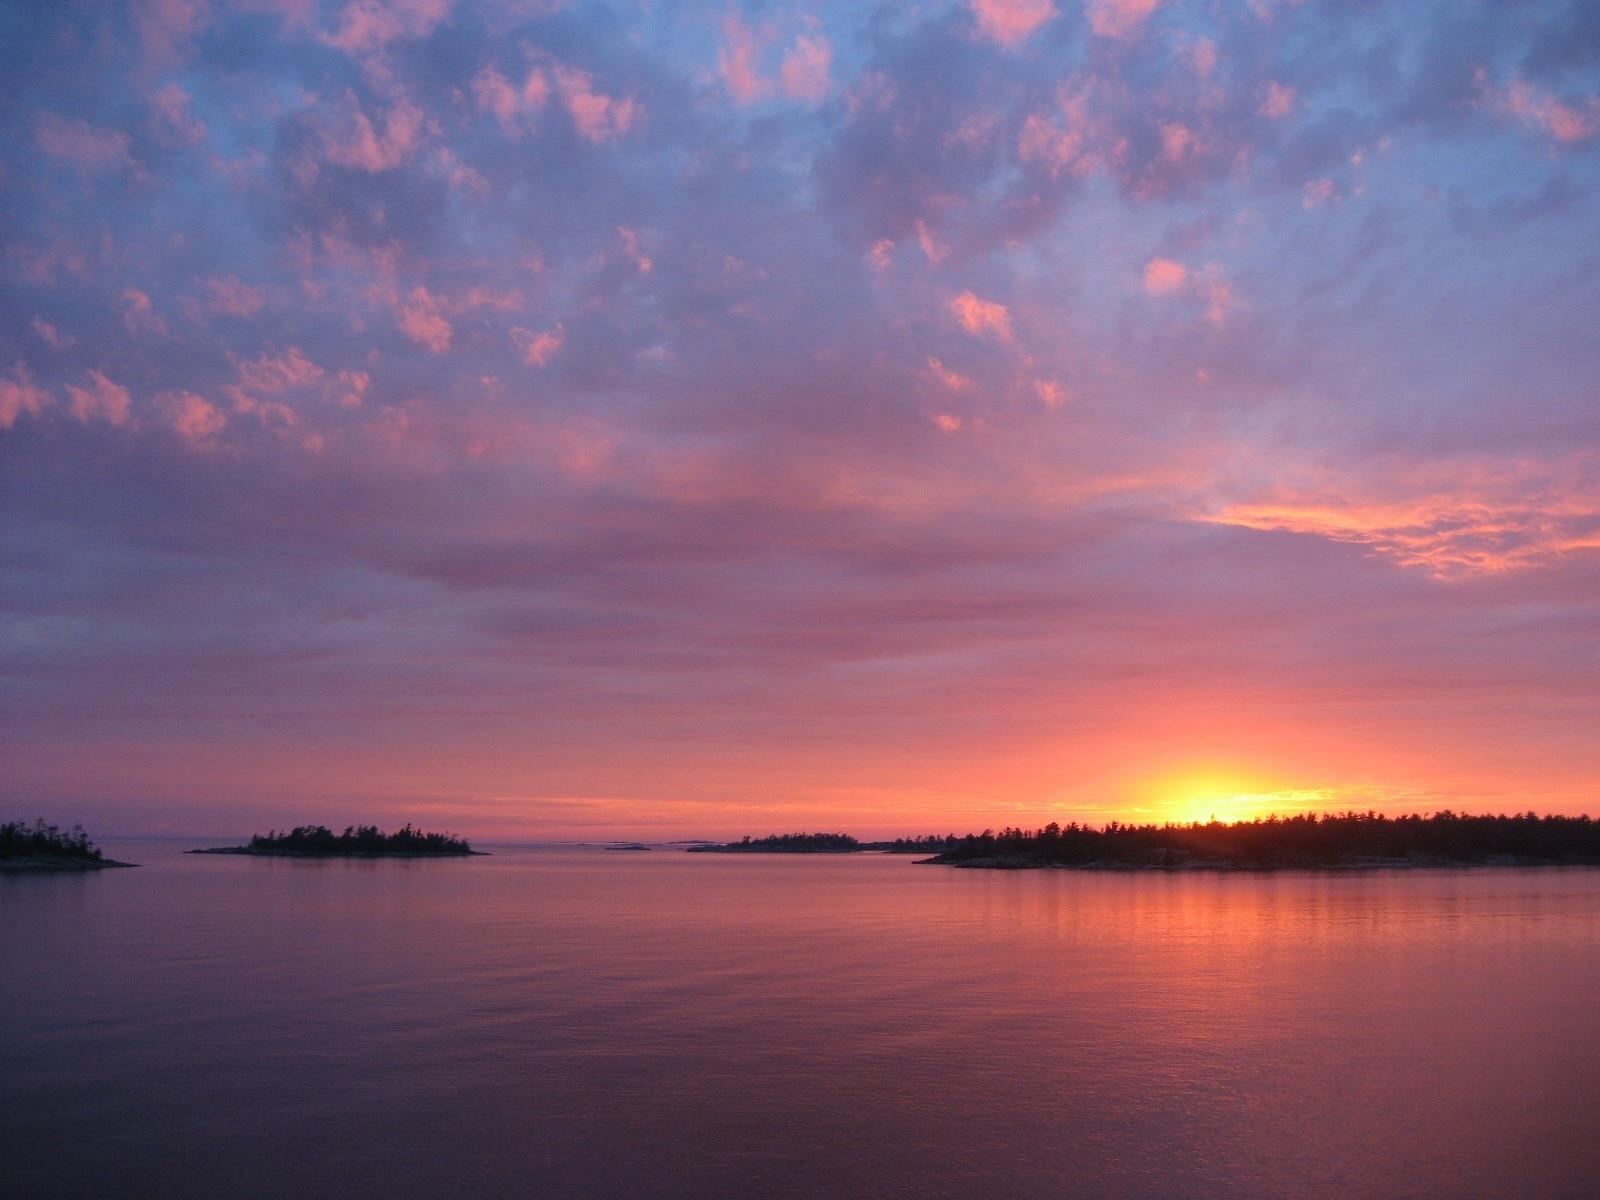 The Archipelago, Ontario, Canada